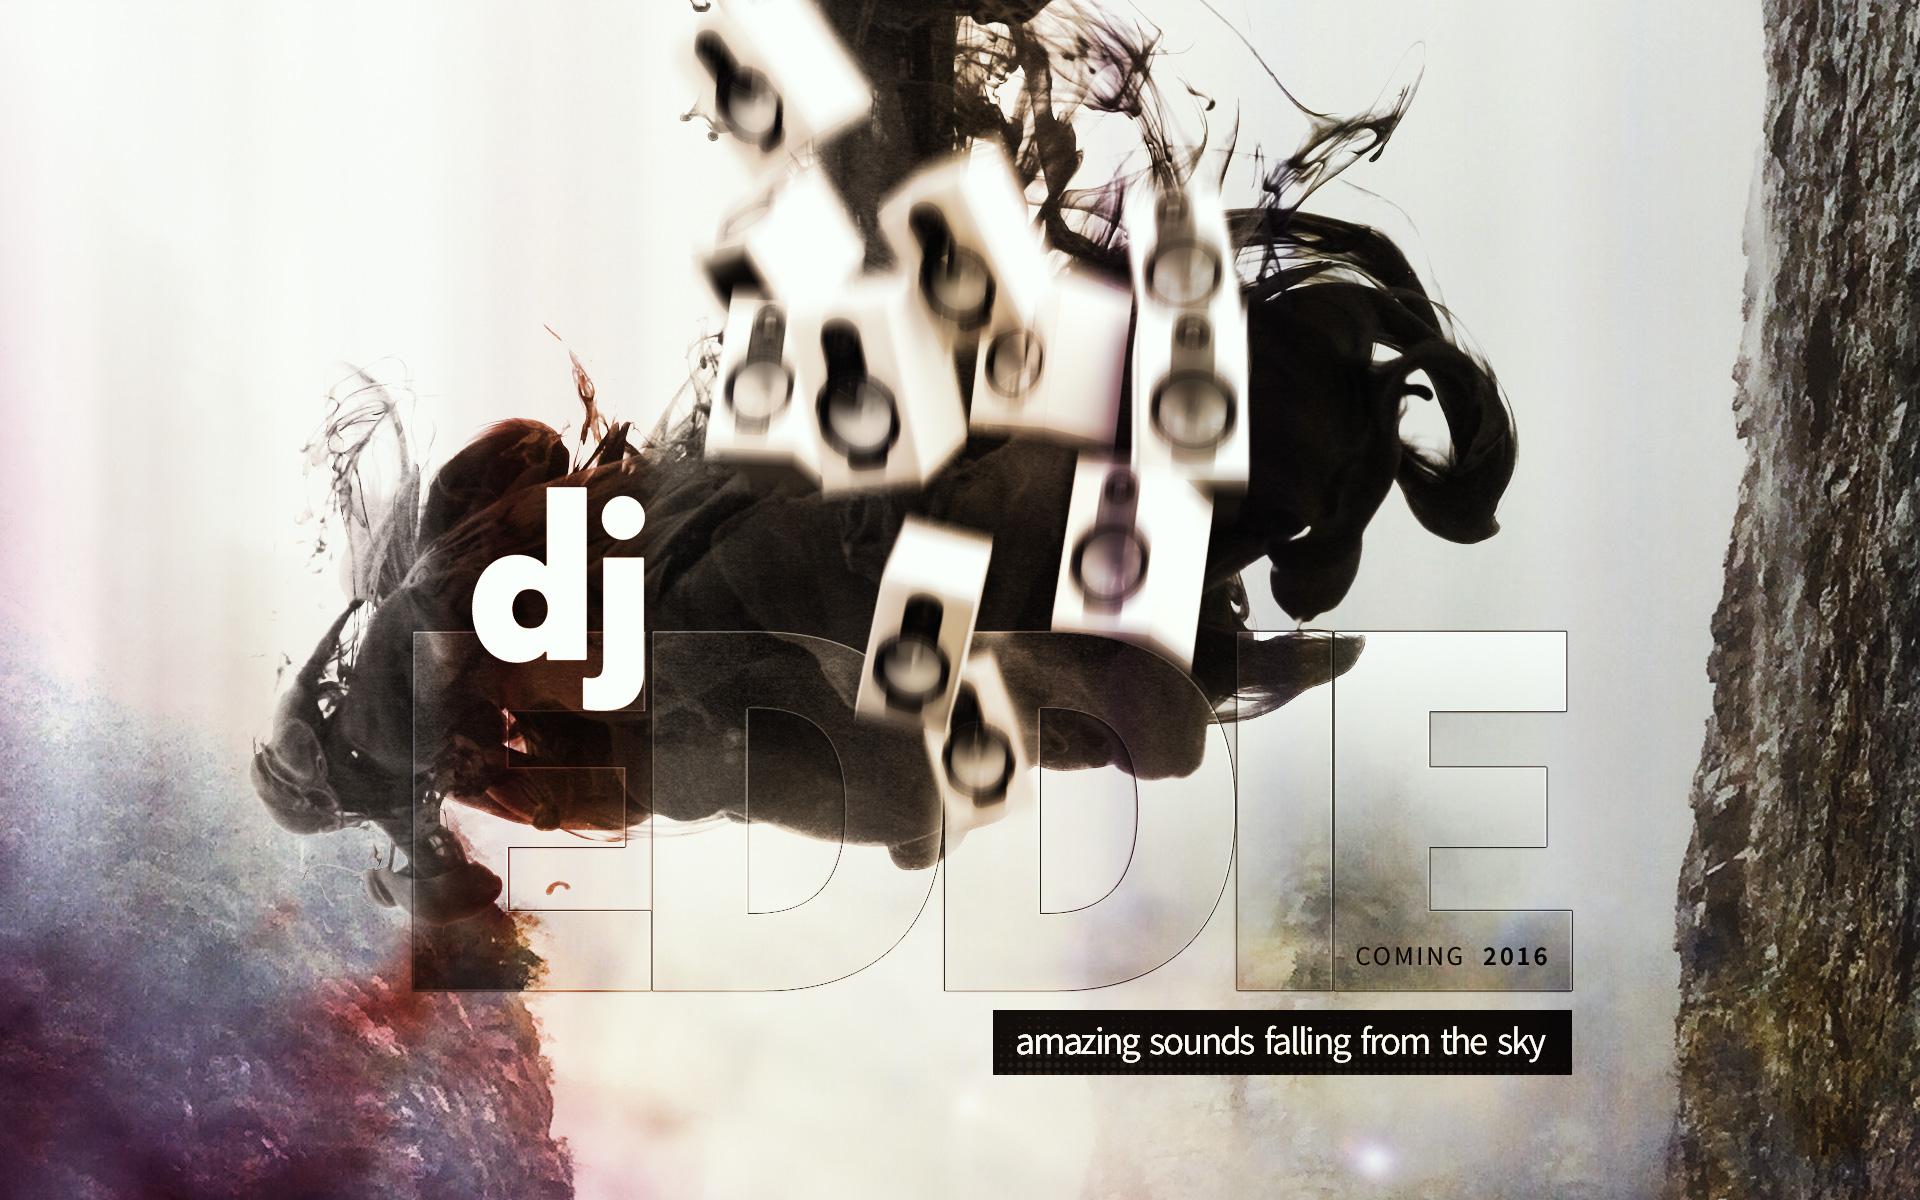 DJ Eddie 2016